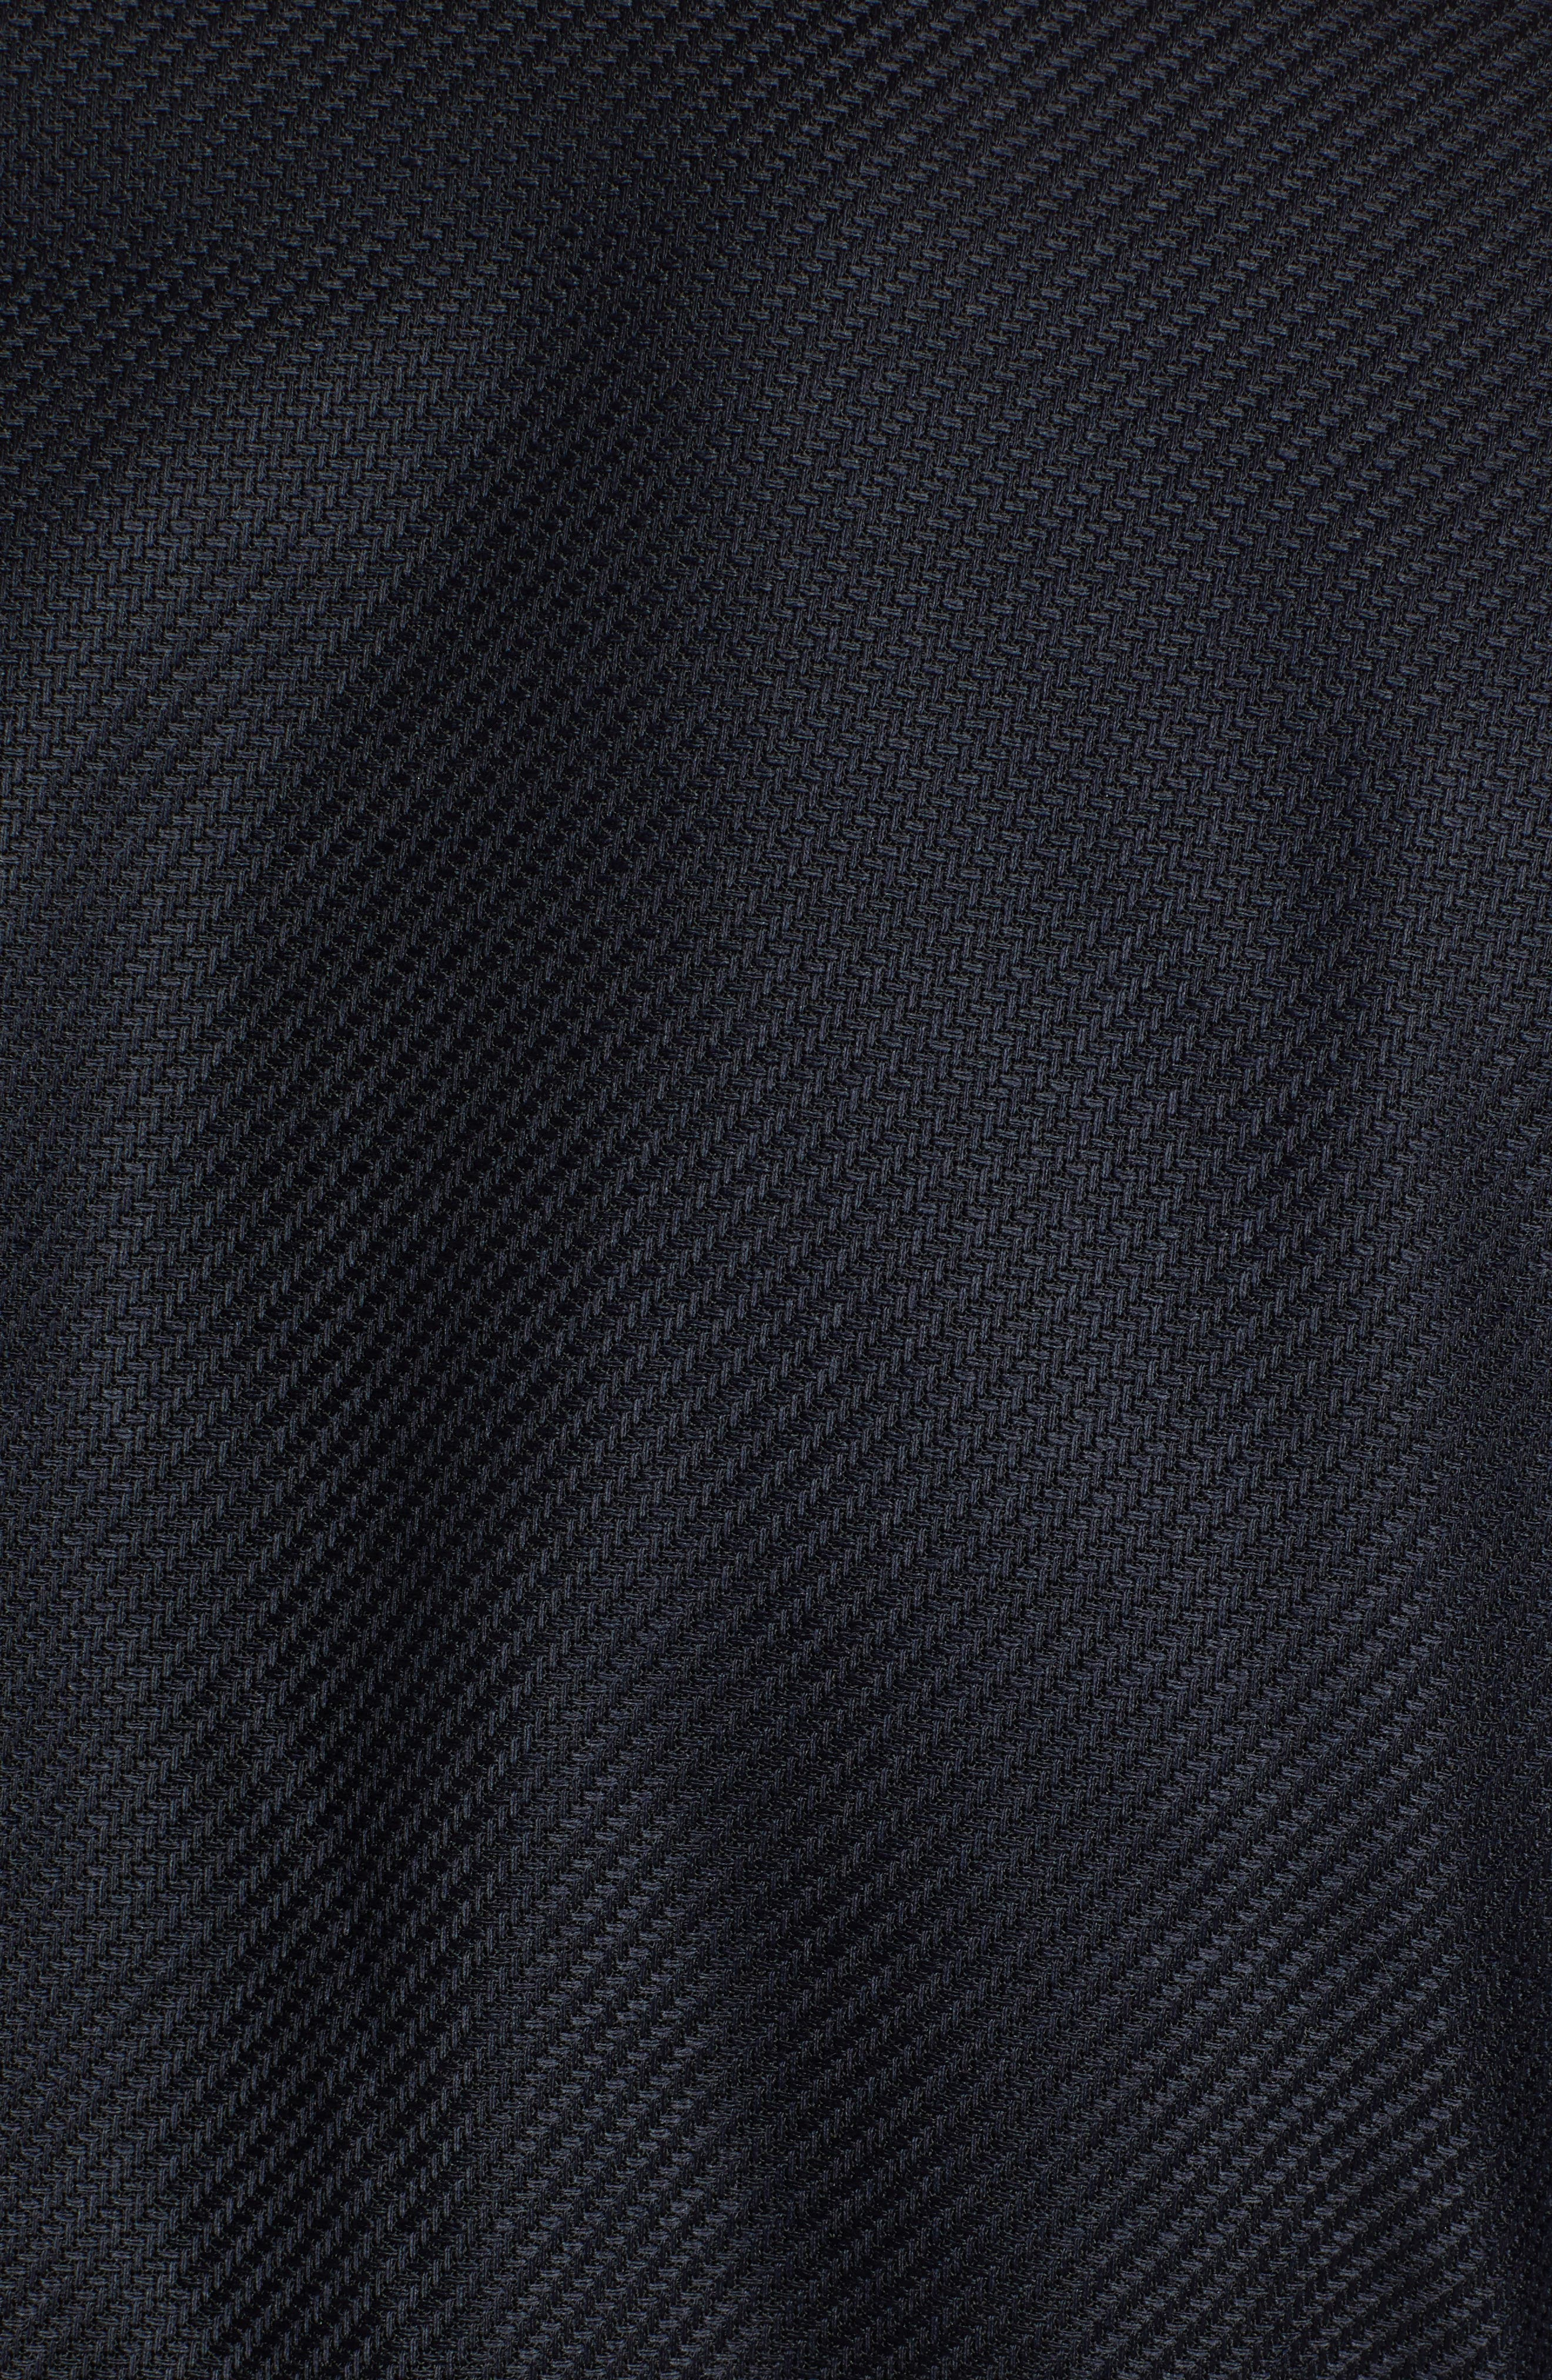 Hockley Slim Fit Wool Dinner Jacket,                             Alternate thumbnail 5, color,                             OPEN BLUE